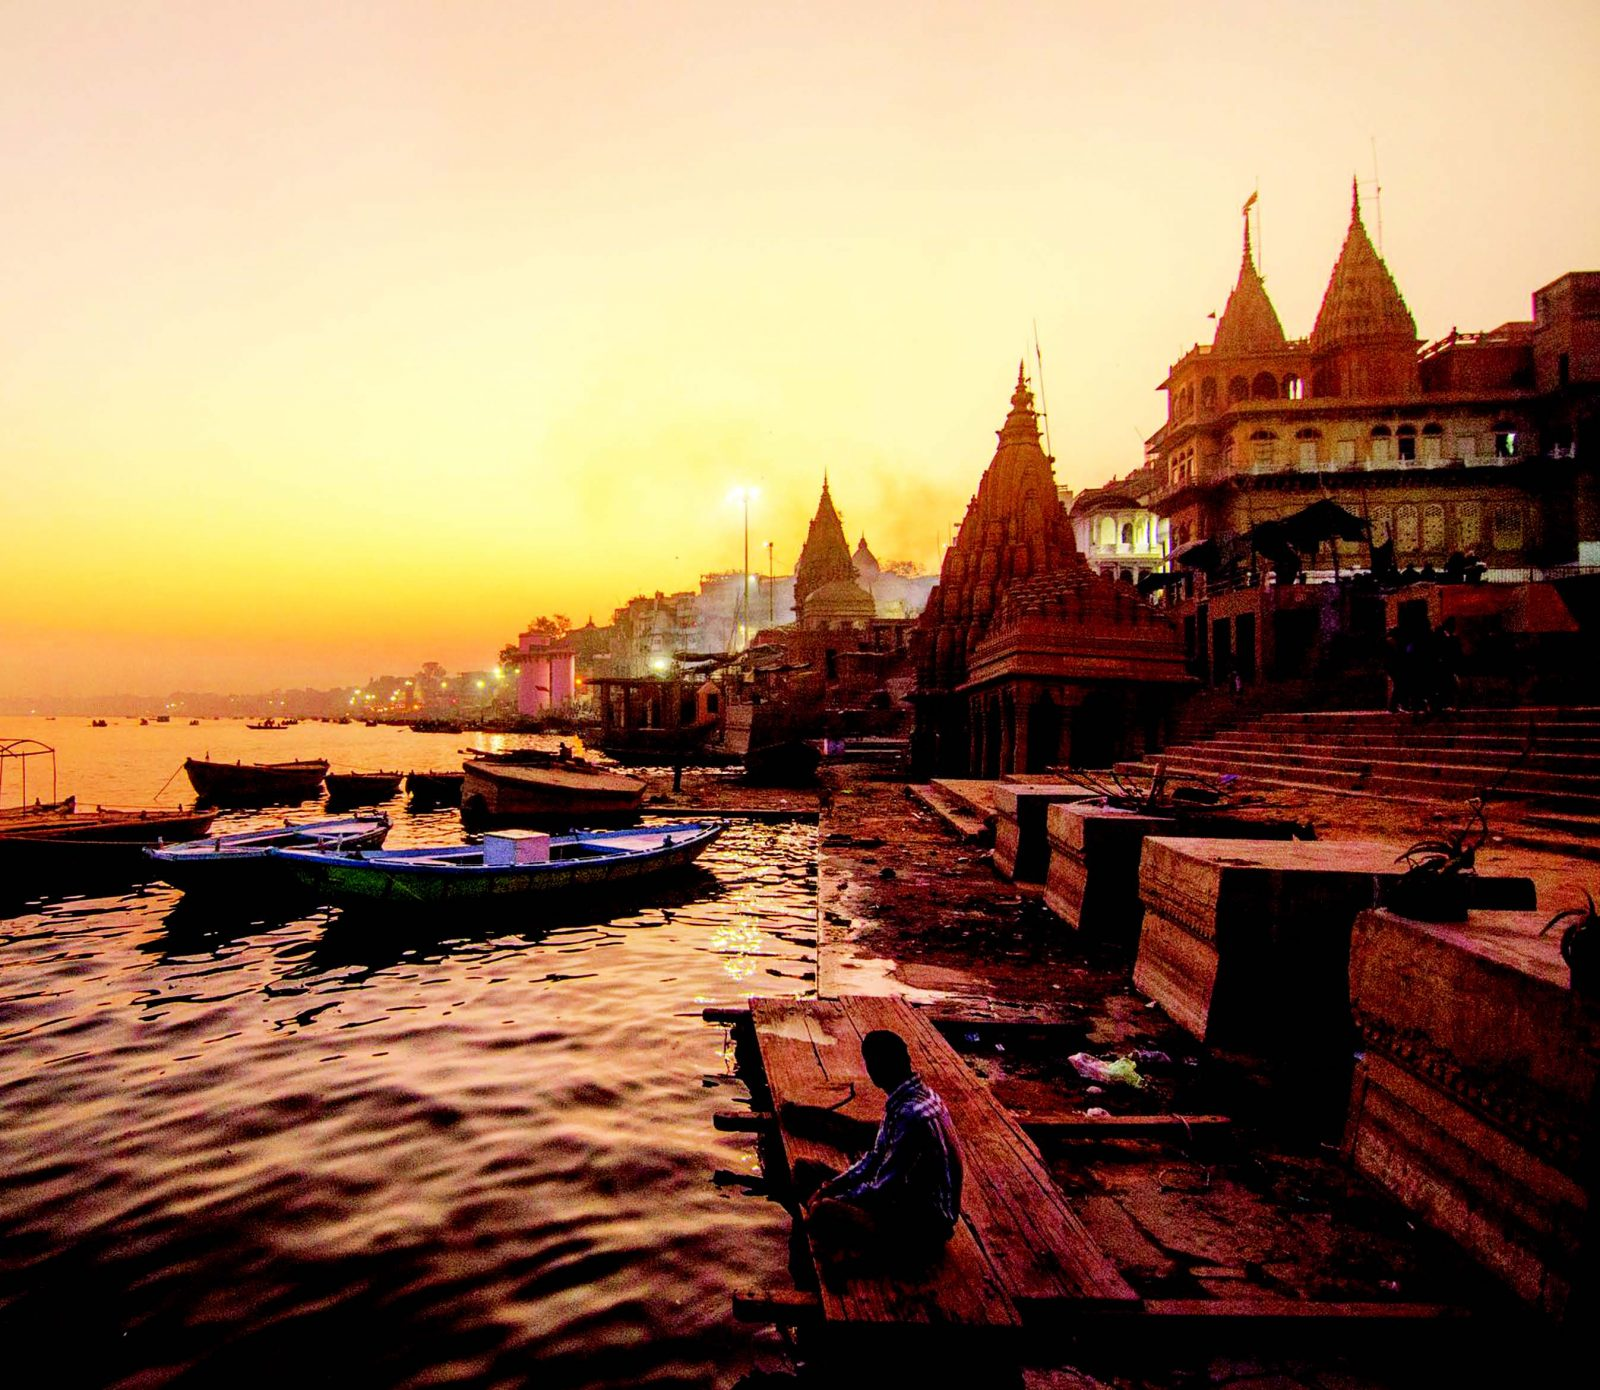 Varanasi, Indias Holiest City | Earth Trekkers